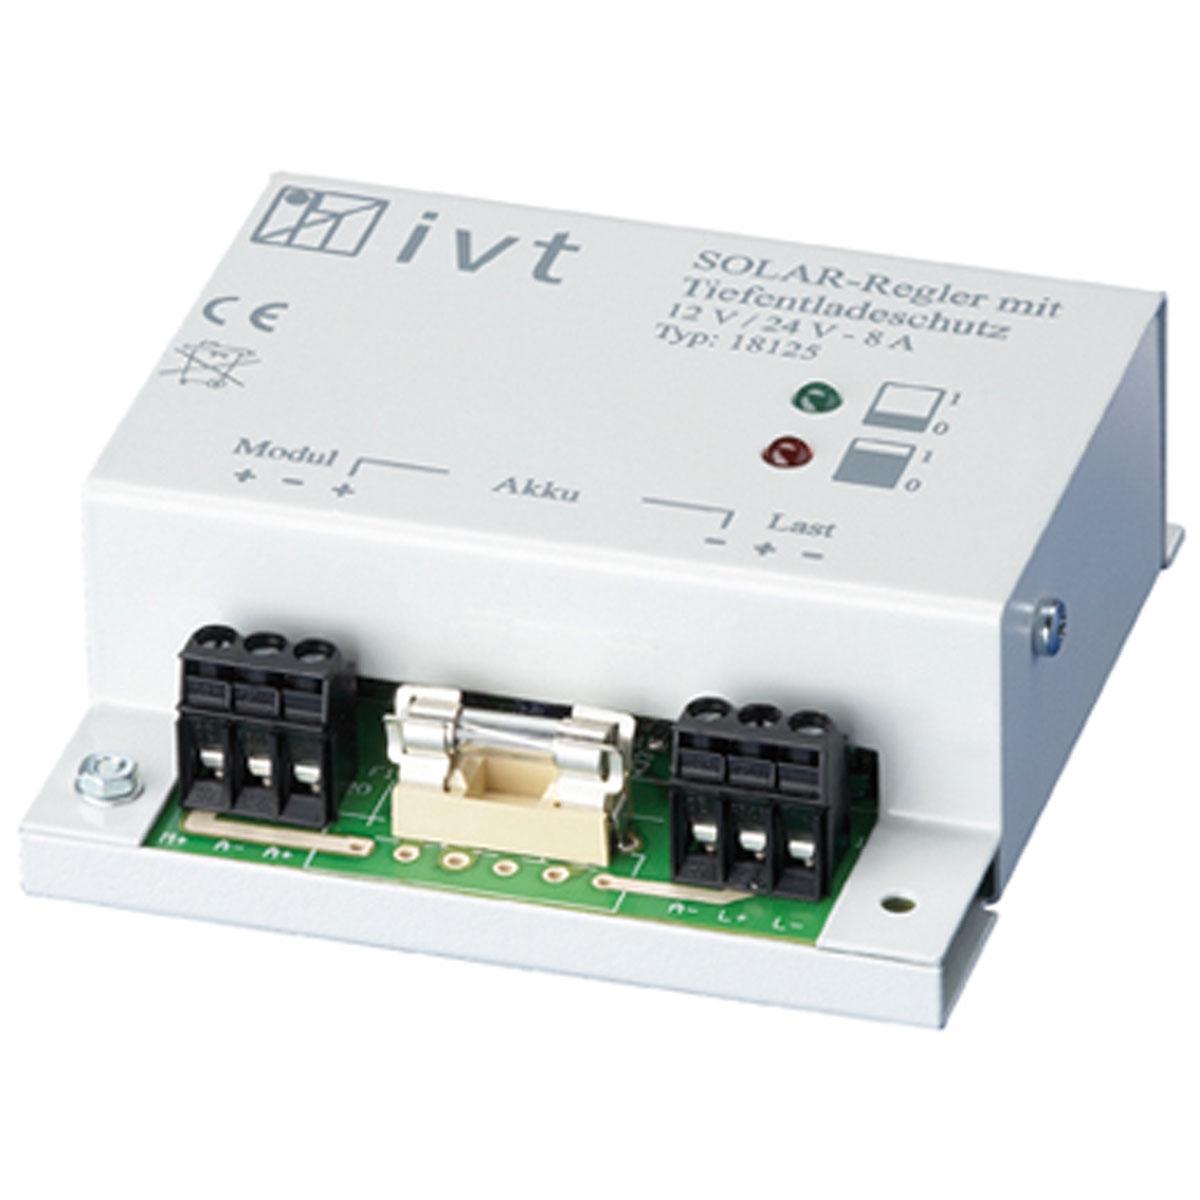 Shunt Solar-Controller 12 V/24 V, 8 A